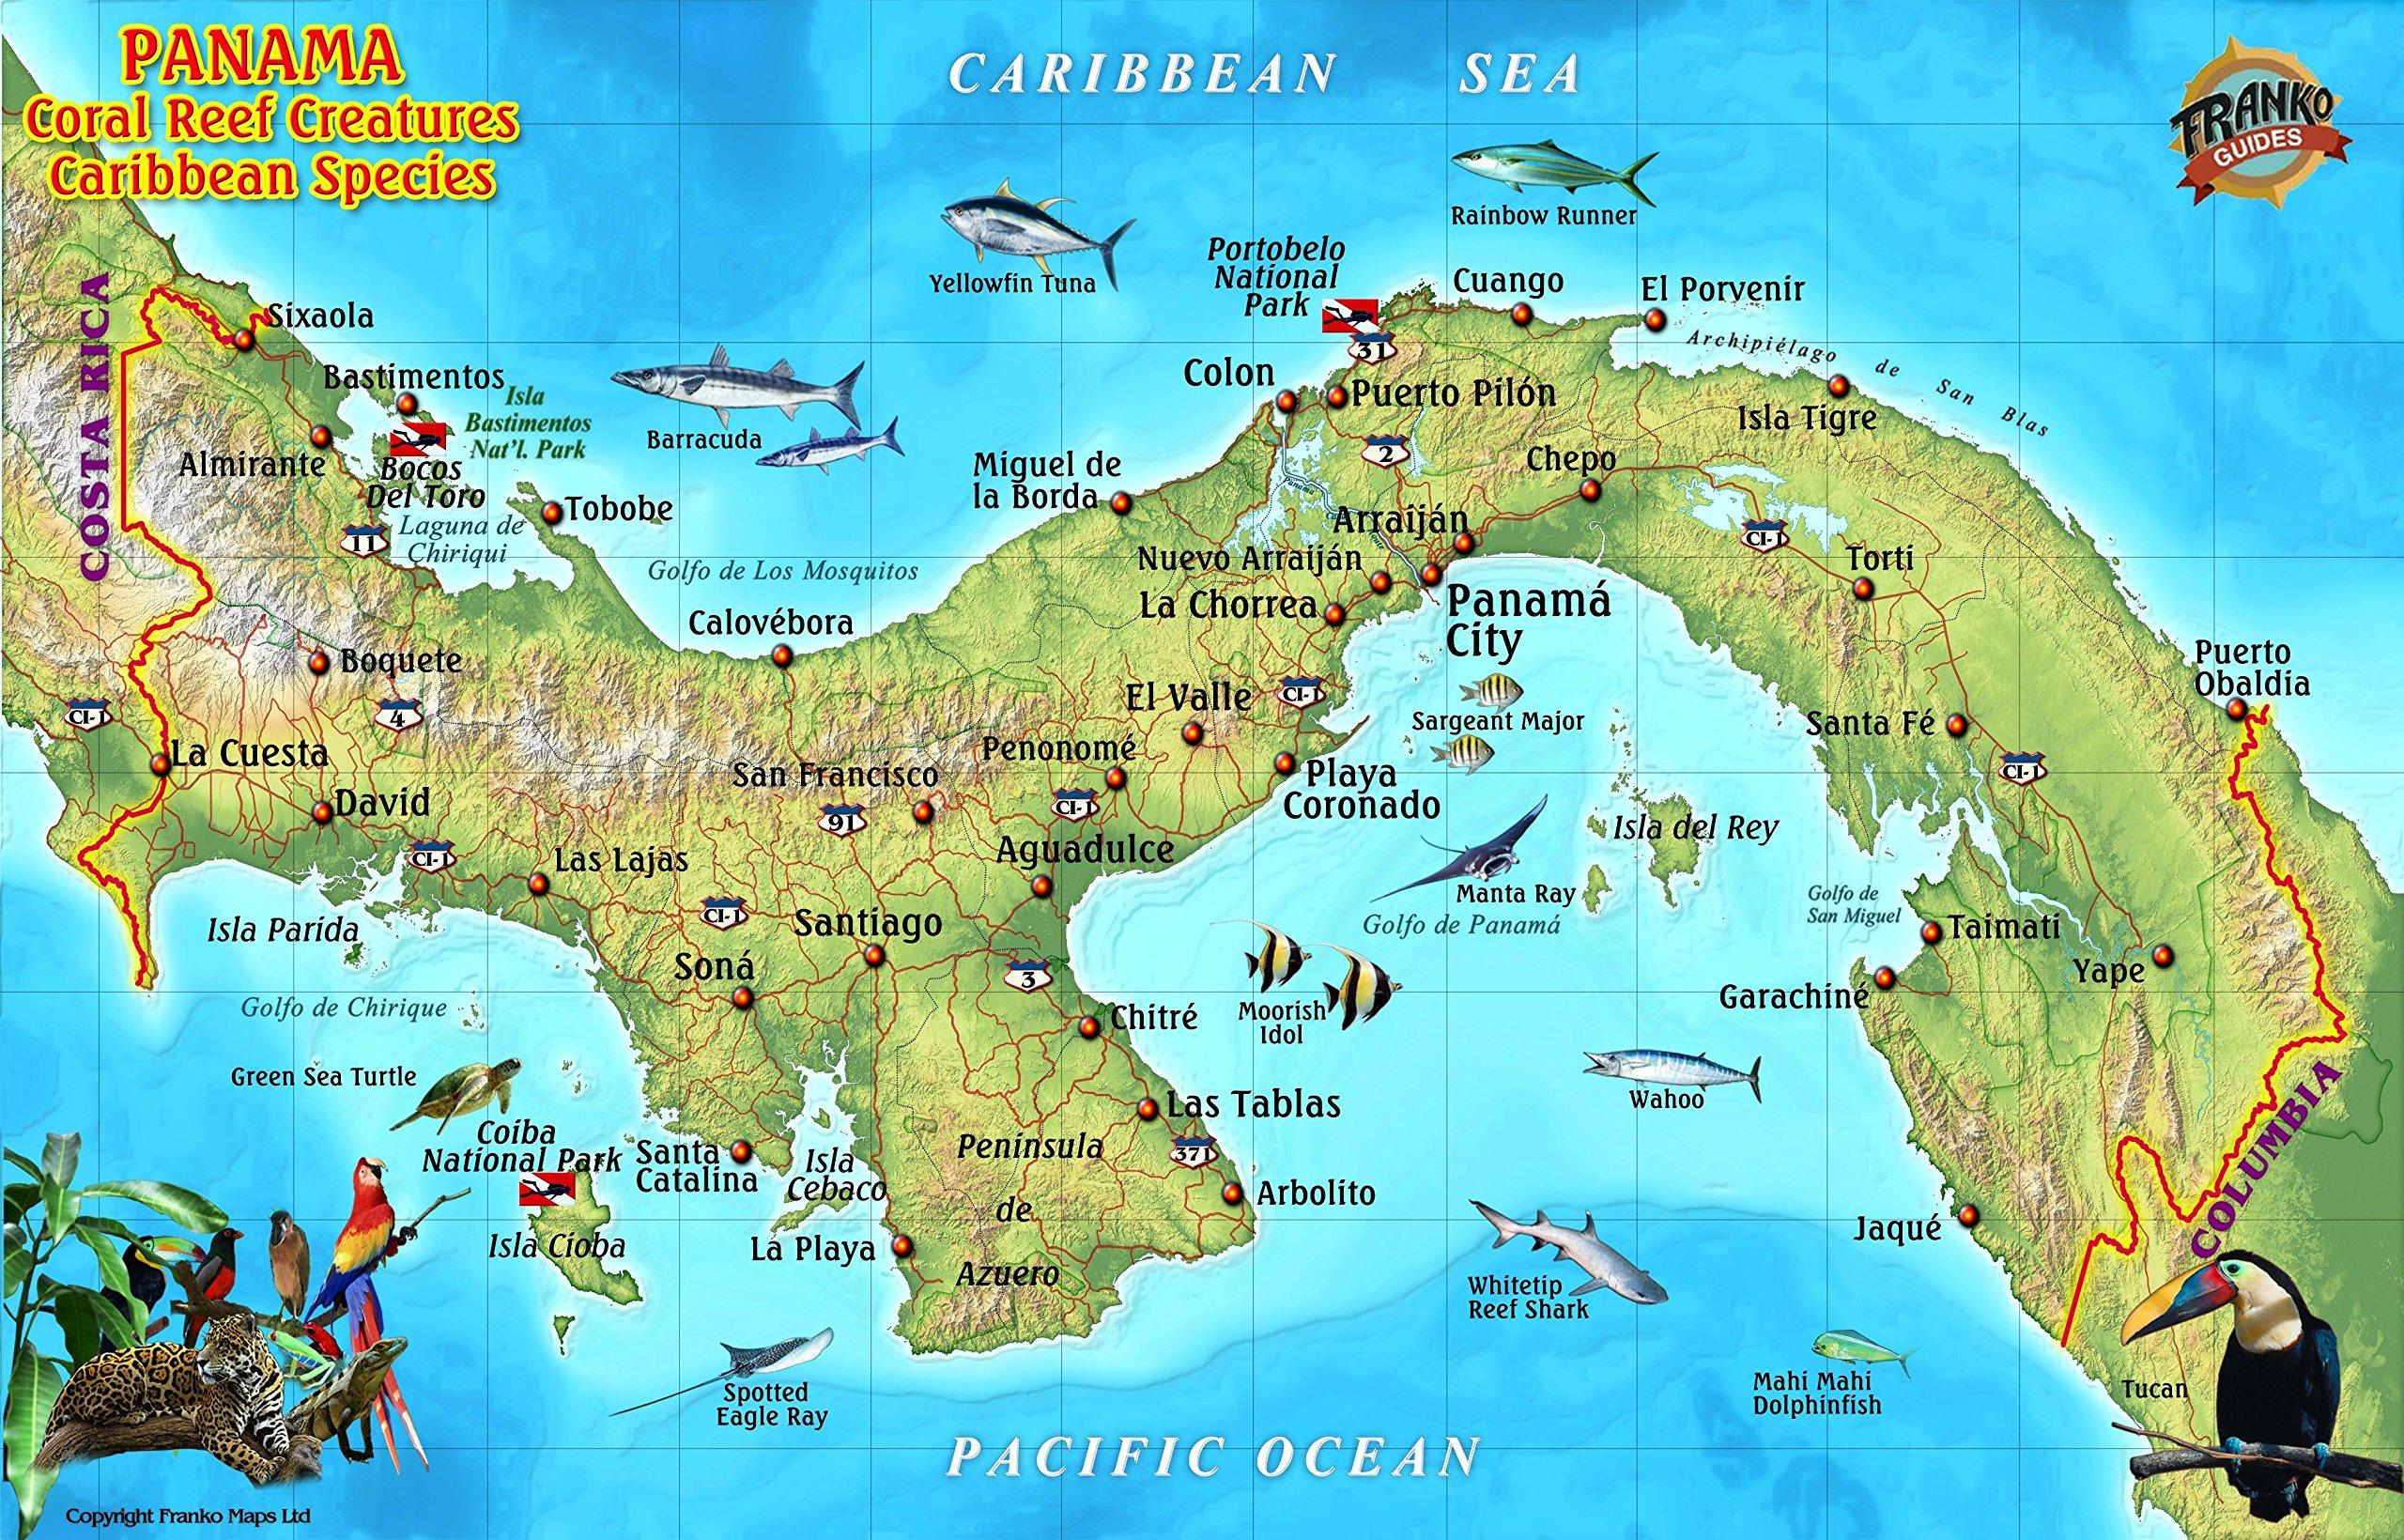 Panama Caribbean Coral Reef Creatures Guide Franko Maps ... on carti panama, large map of panama, atlas de panama, flag de panama, david panama, continental divide panama, rep de panama, mapa de panama, political map of panama, country of panama, map of panama central america, map of panama canal waterway, poblacion de panama, portobelo panama,